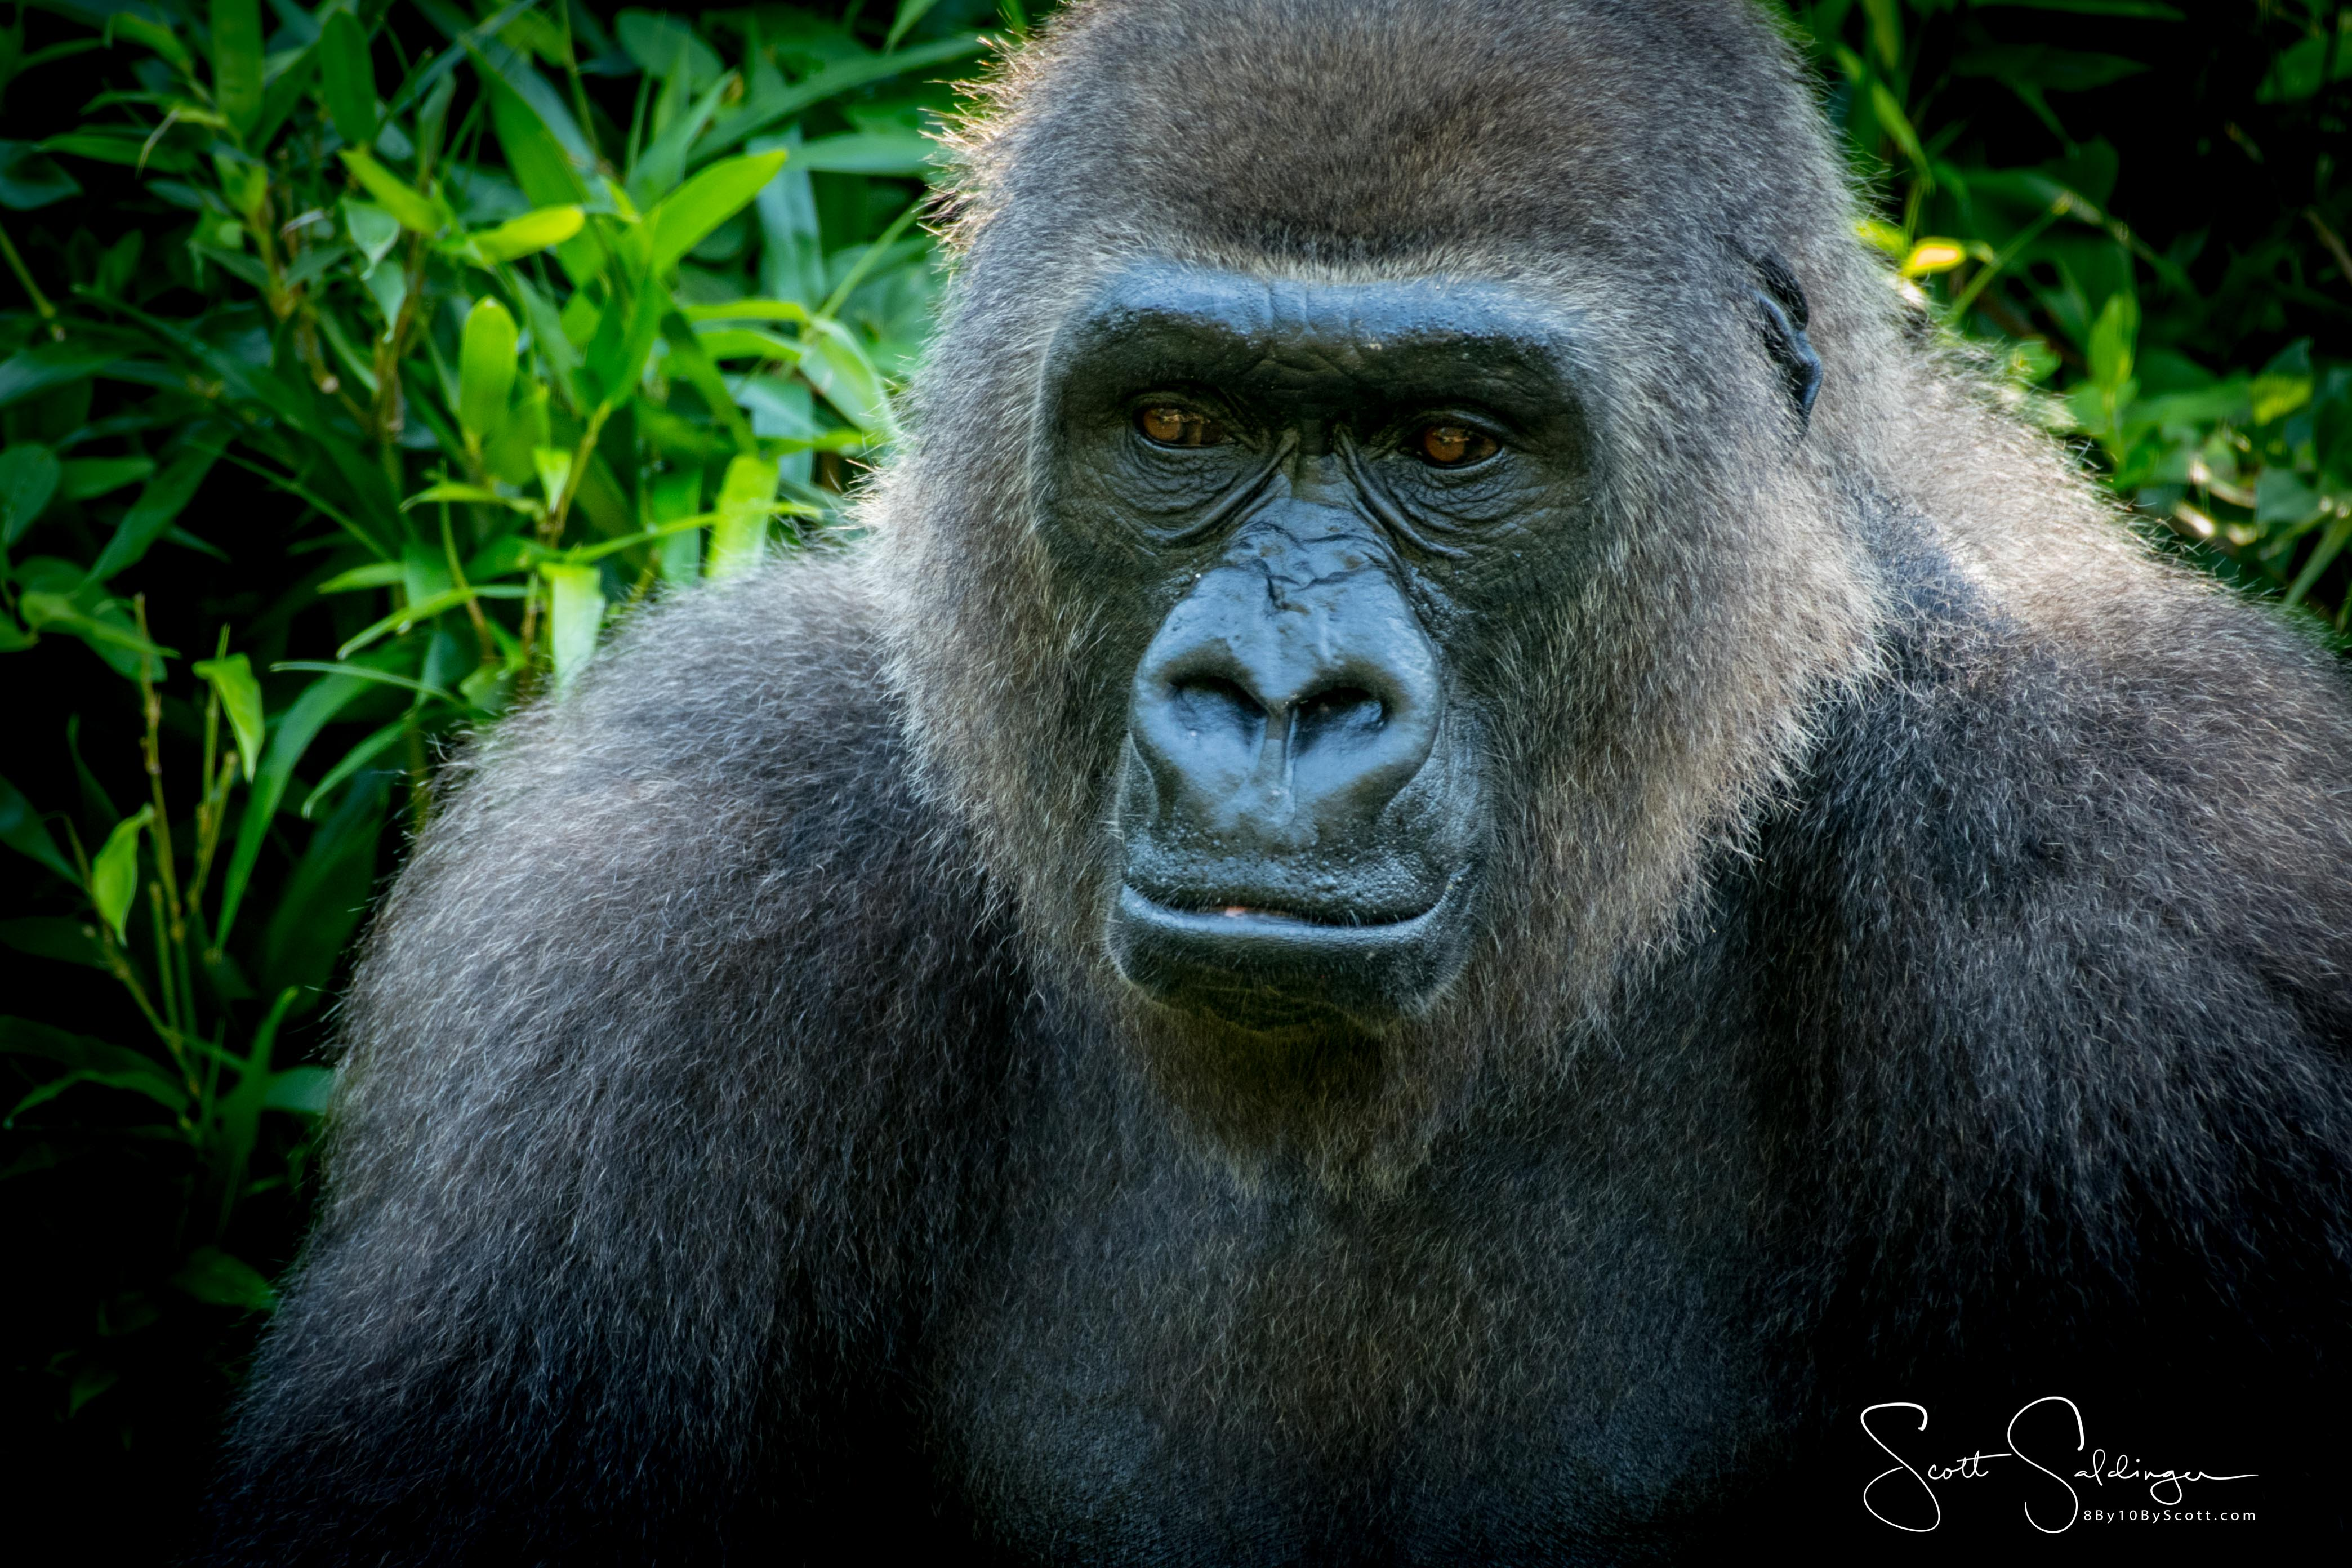 Apes-5855